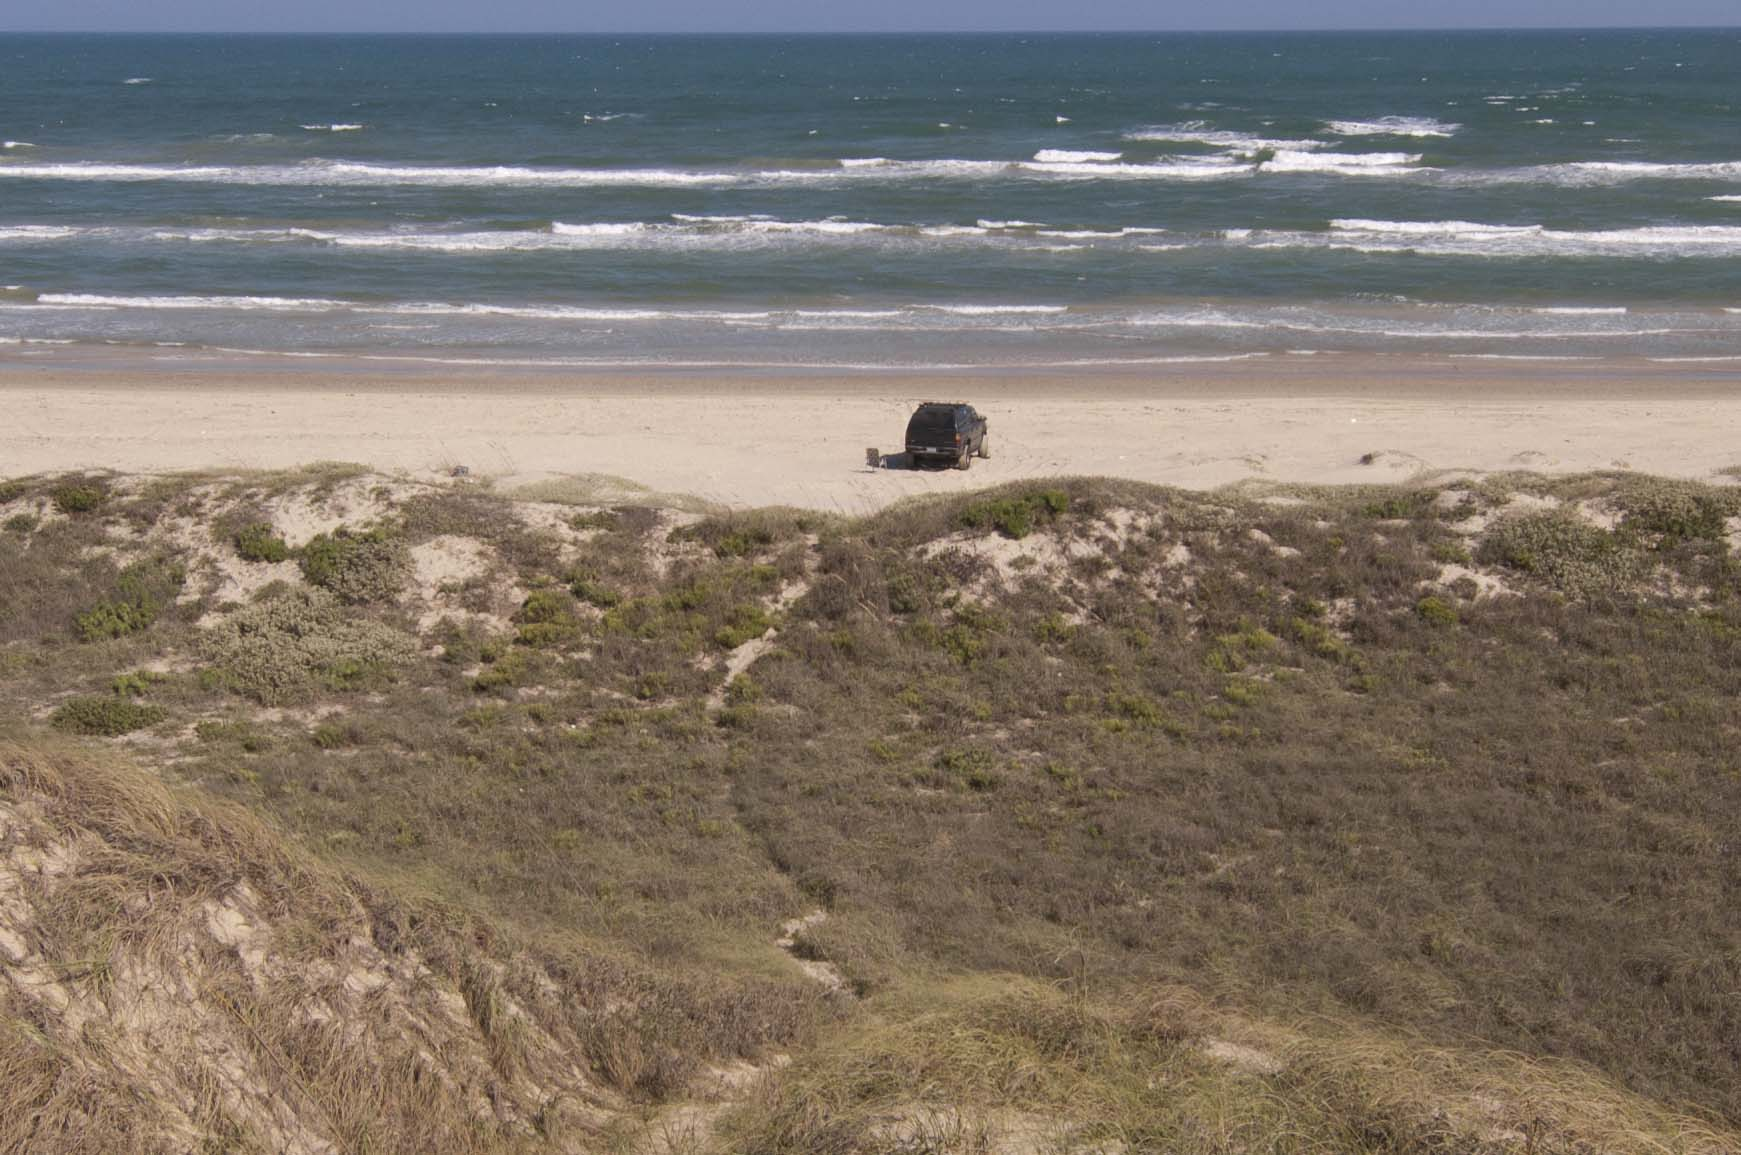 pins-2012-big-dune-dsc_0094